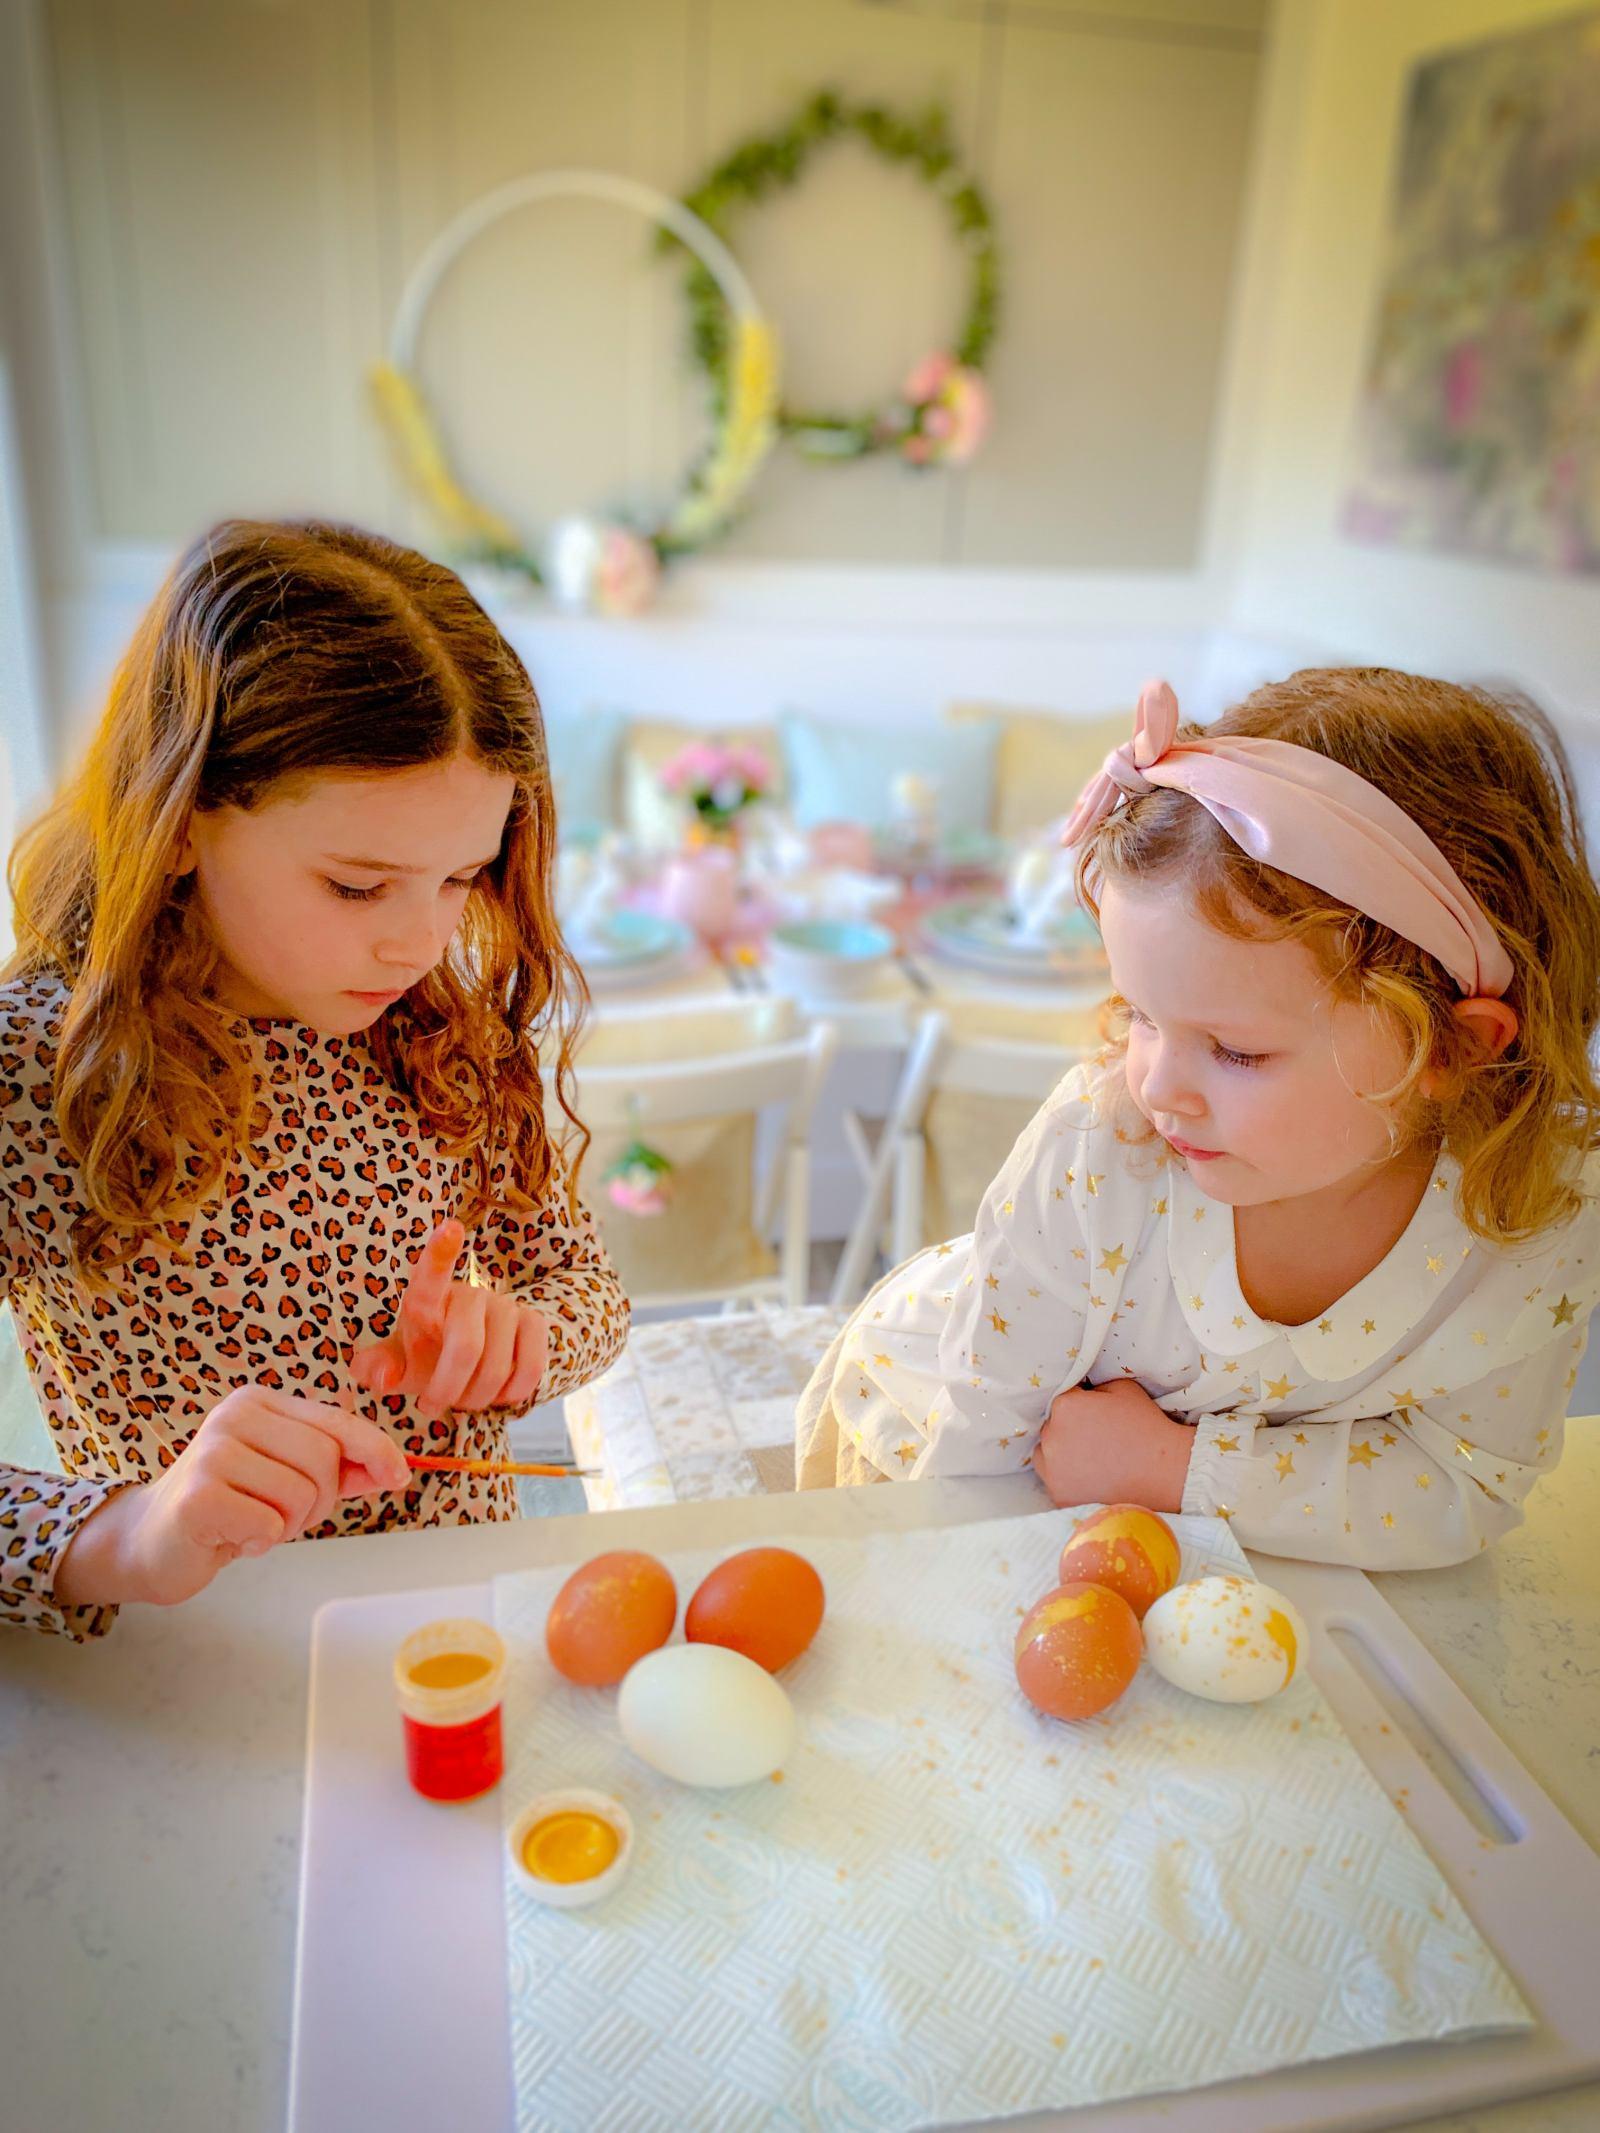 DIY gold speckled eggs